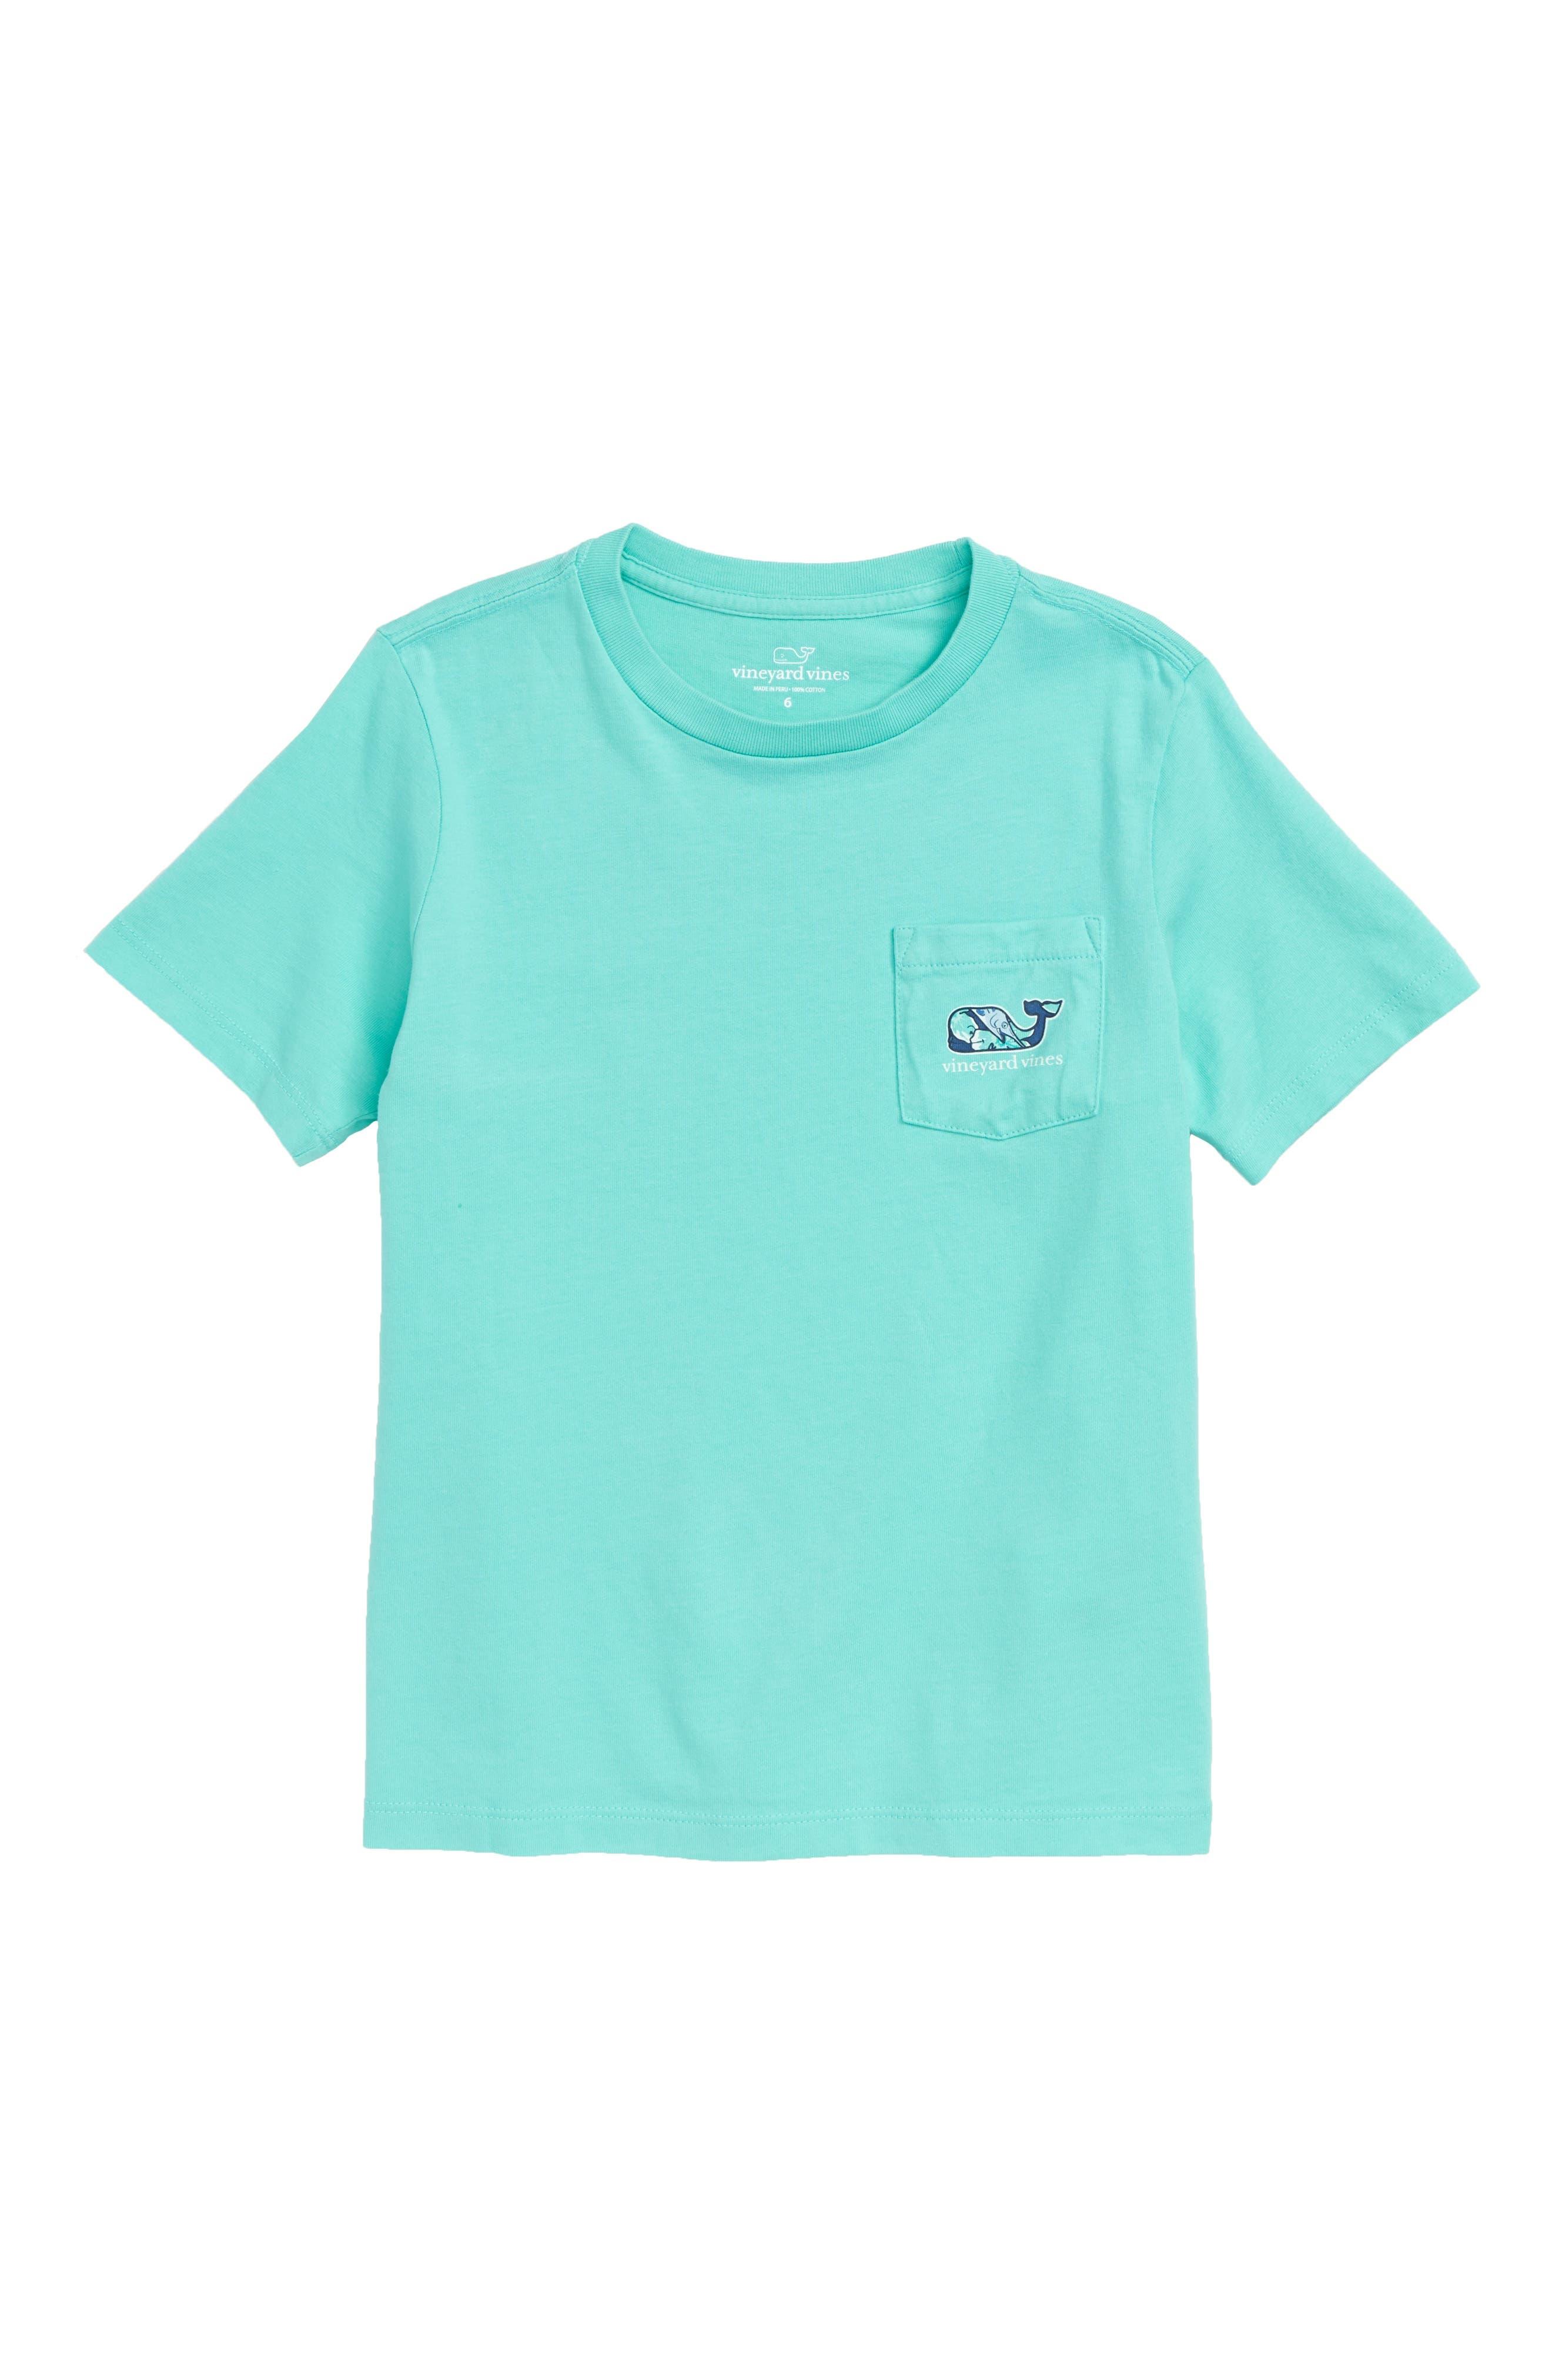 Marlin Flowers Whale Pocket T-Shirt,                         Main,                         color, CAPRI BLUE